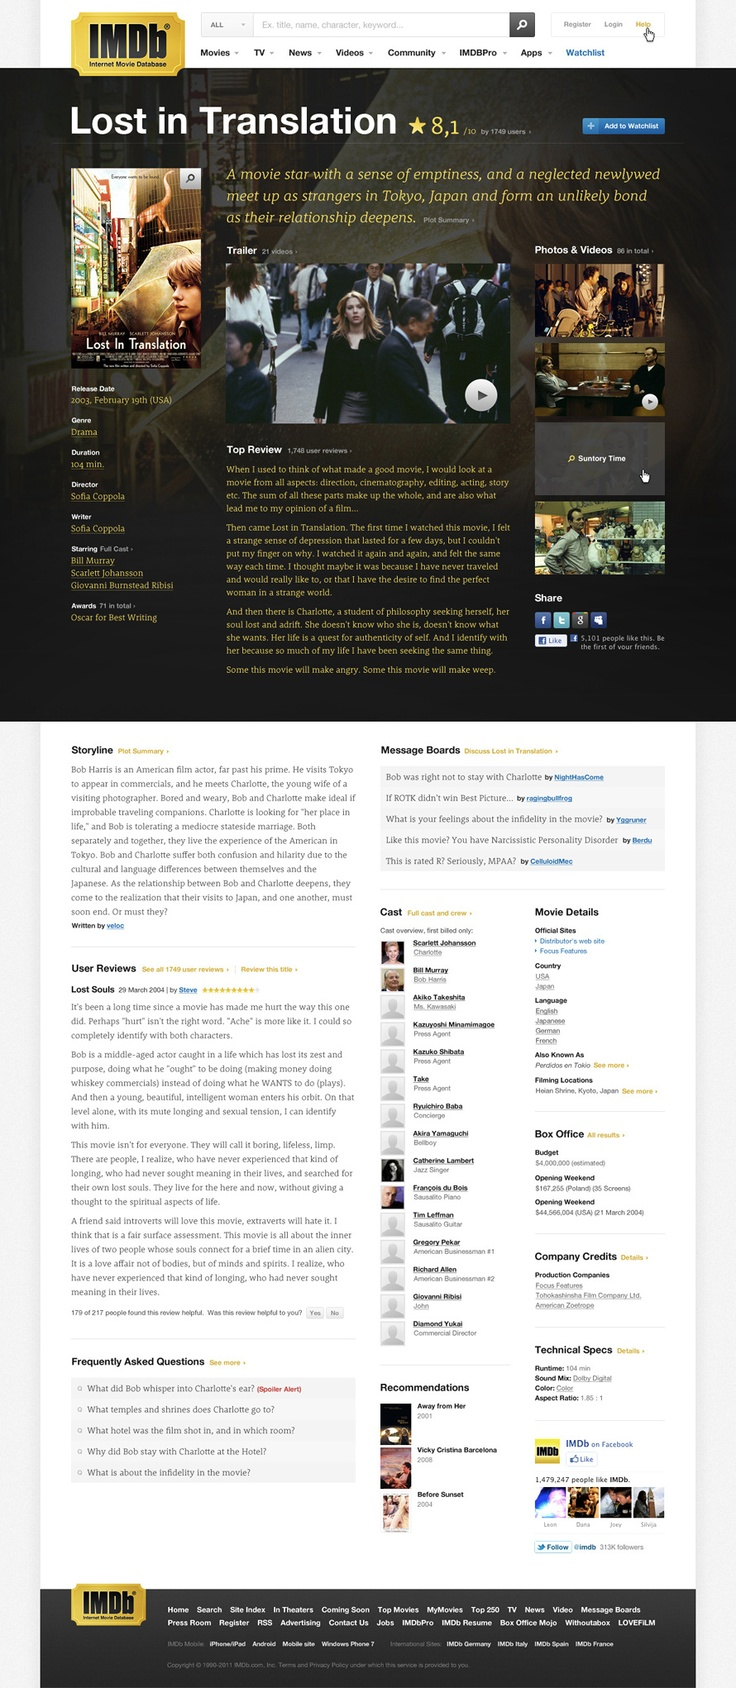 Web Design  Dutch  Who. 30 best D E S I G N   U I images on Pinterest   Website designs